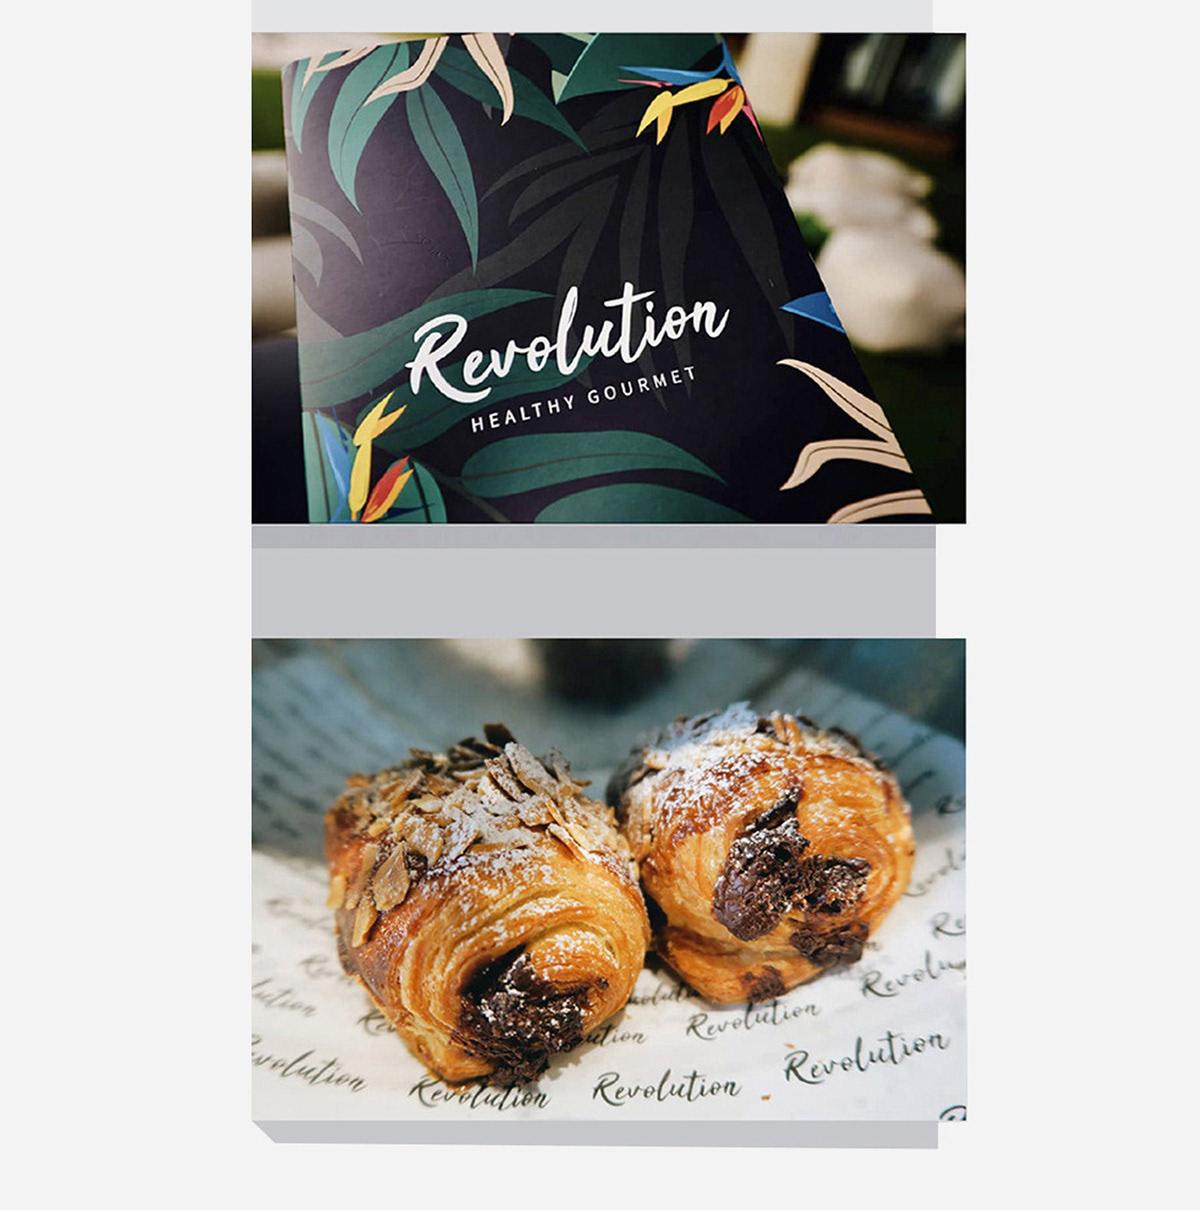 Packaging Food  identity ILLUSTRATION  pattern green Tropical graphic design  logo Bojana Knezevic